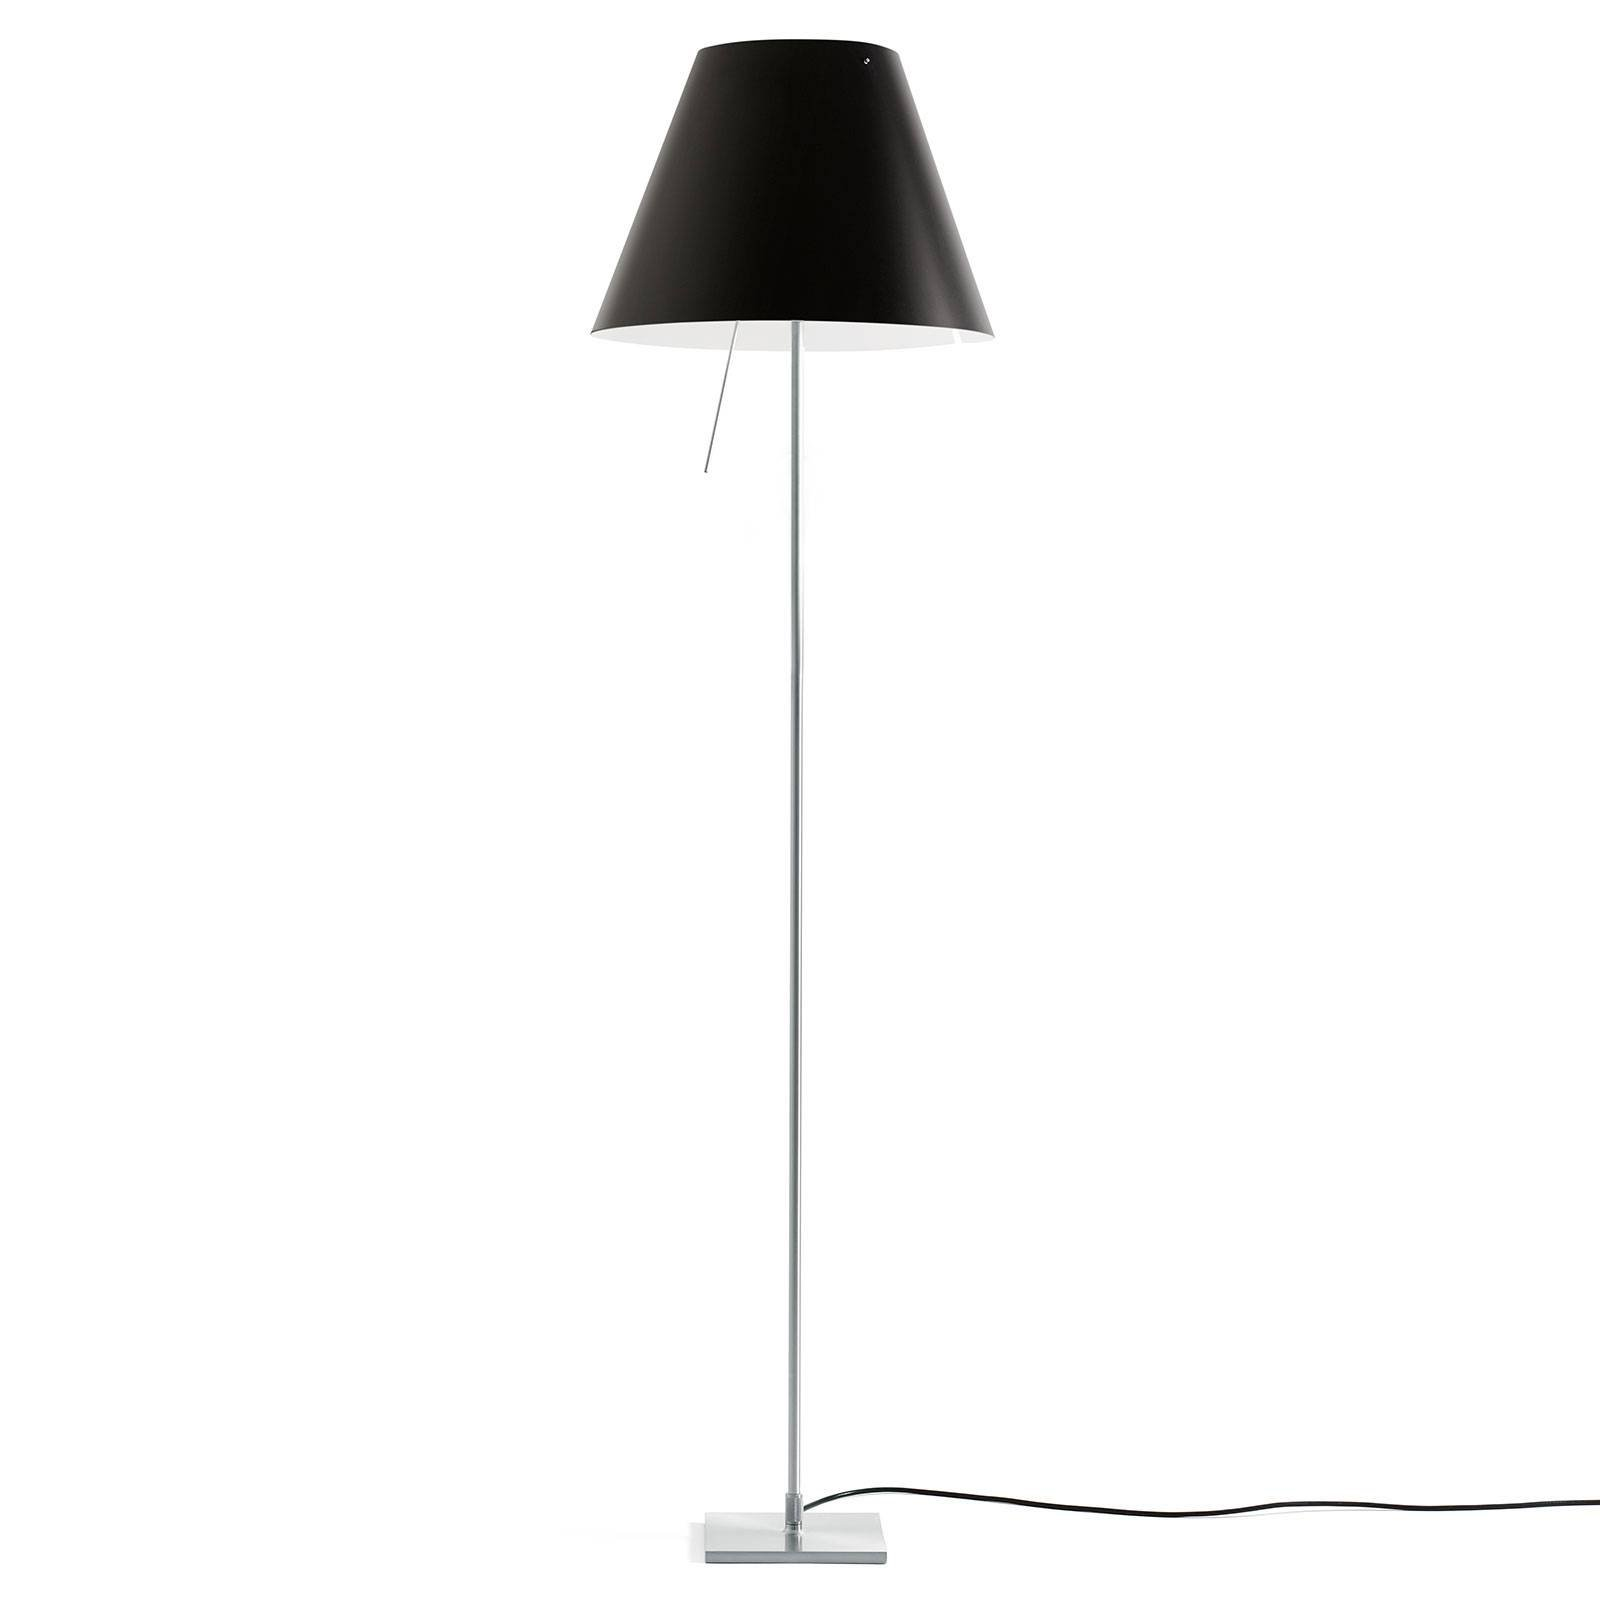 Luceplan Costanza gulvlampe D13tif, alu/svart